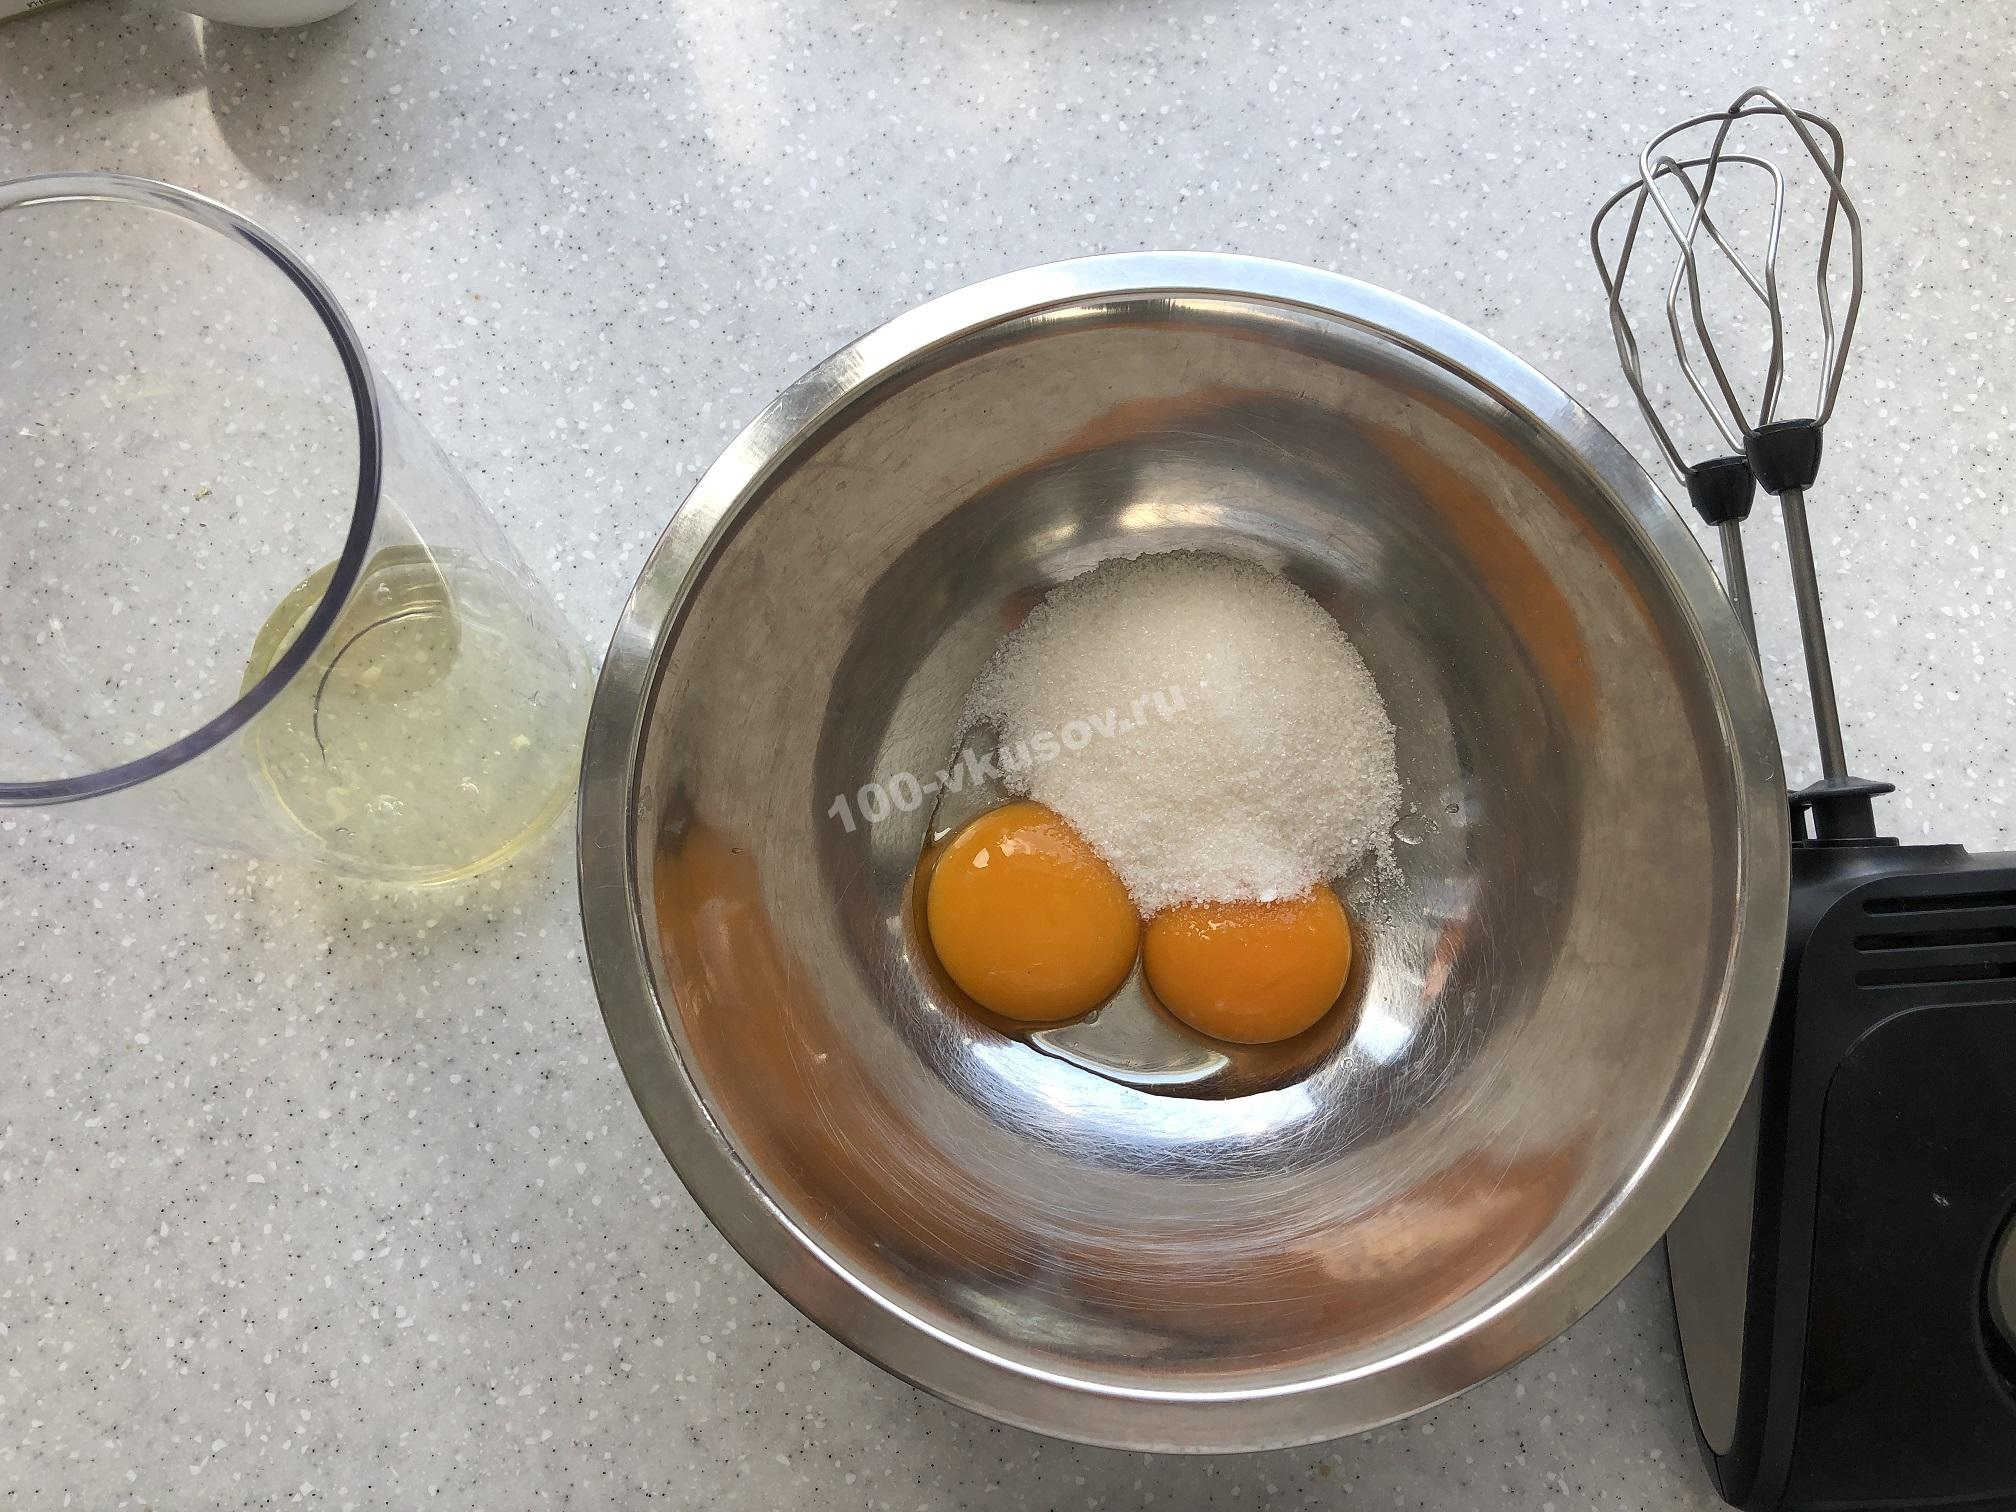 Яйца, сахар и миксер